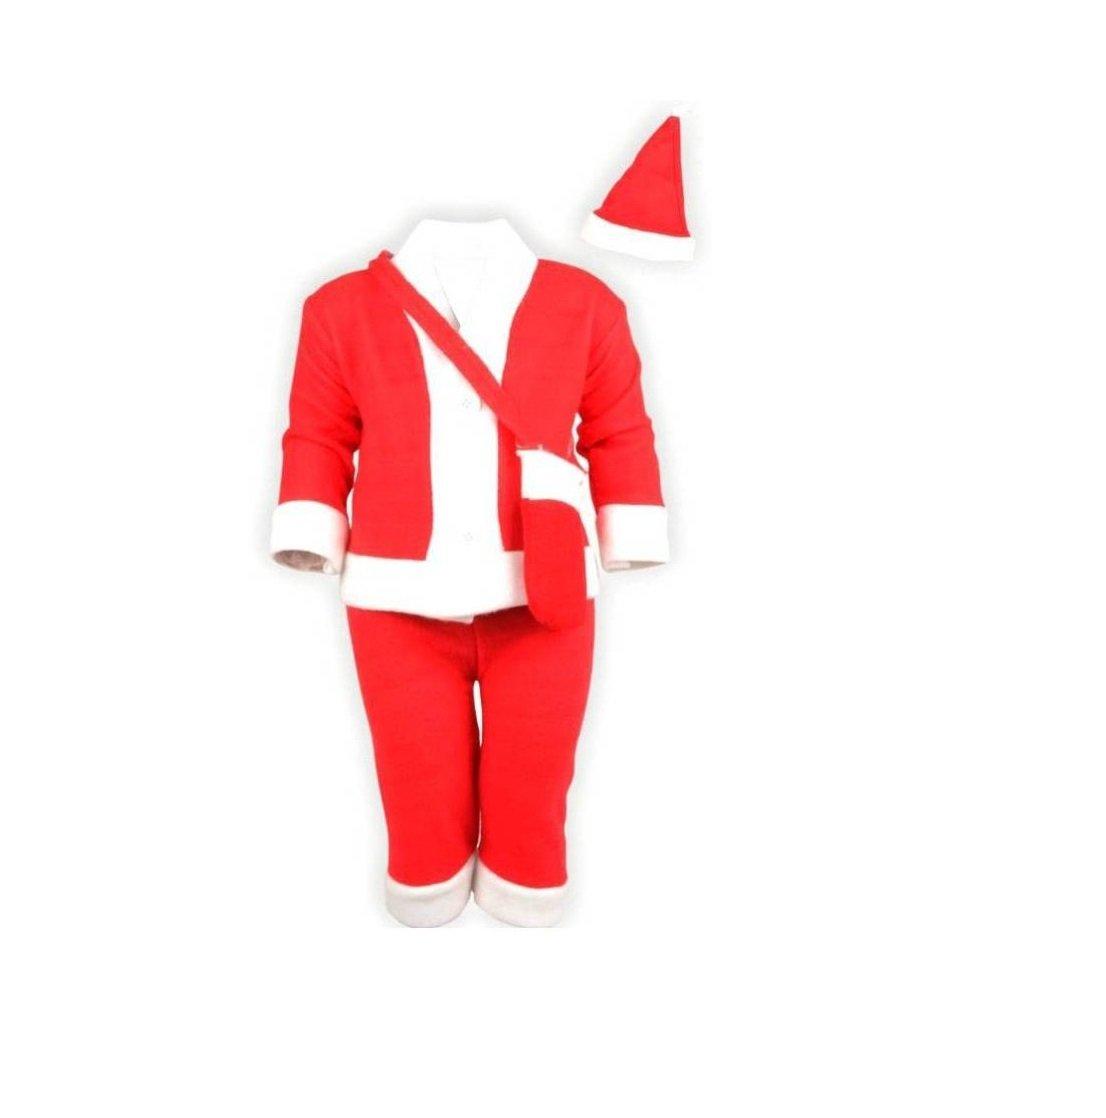 mobison santa claus costume for kids 2 3 years santa claus dress for kids for christmas amazonin toys games - Santa Claus Coat